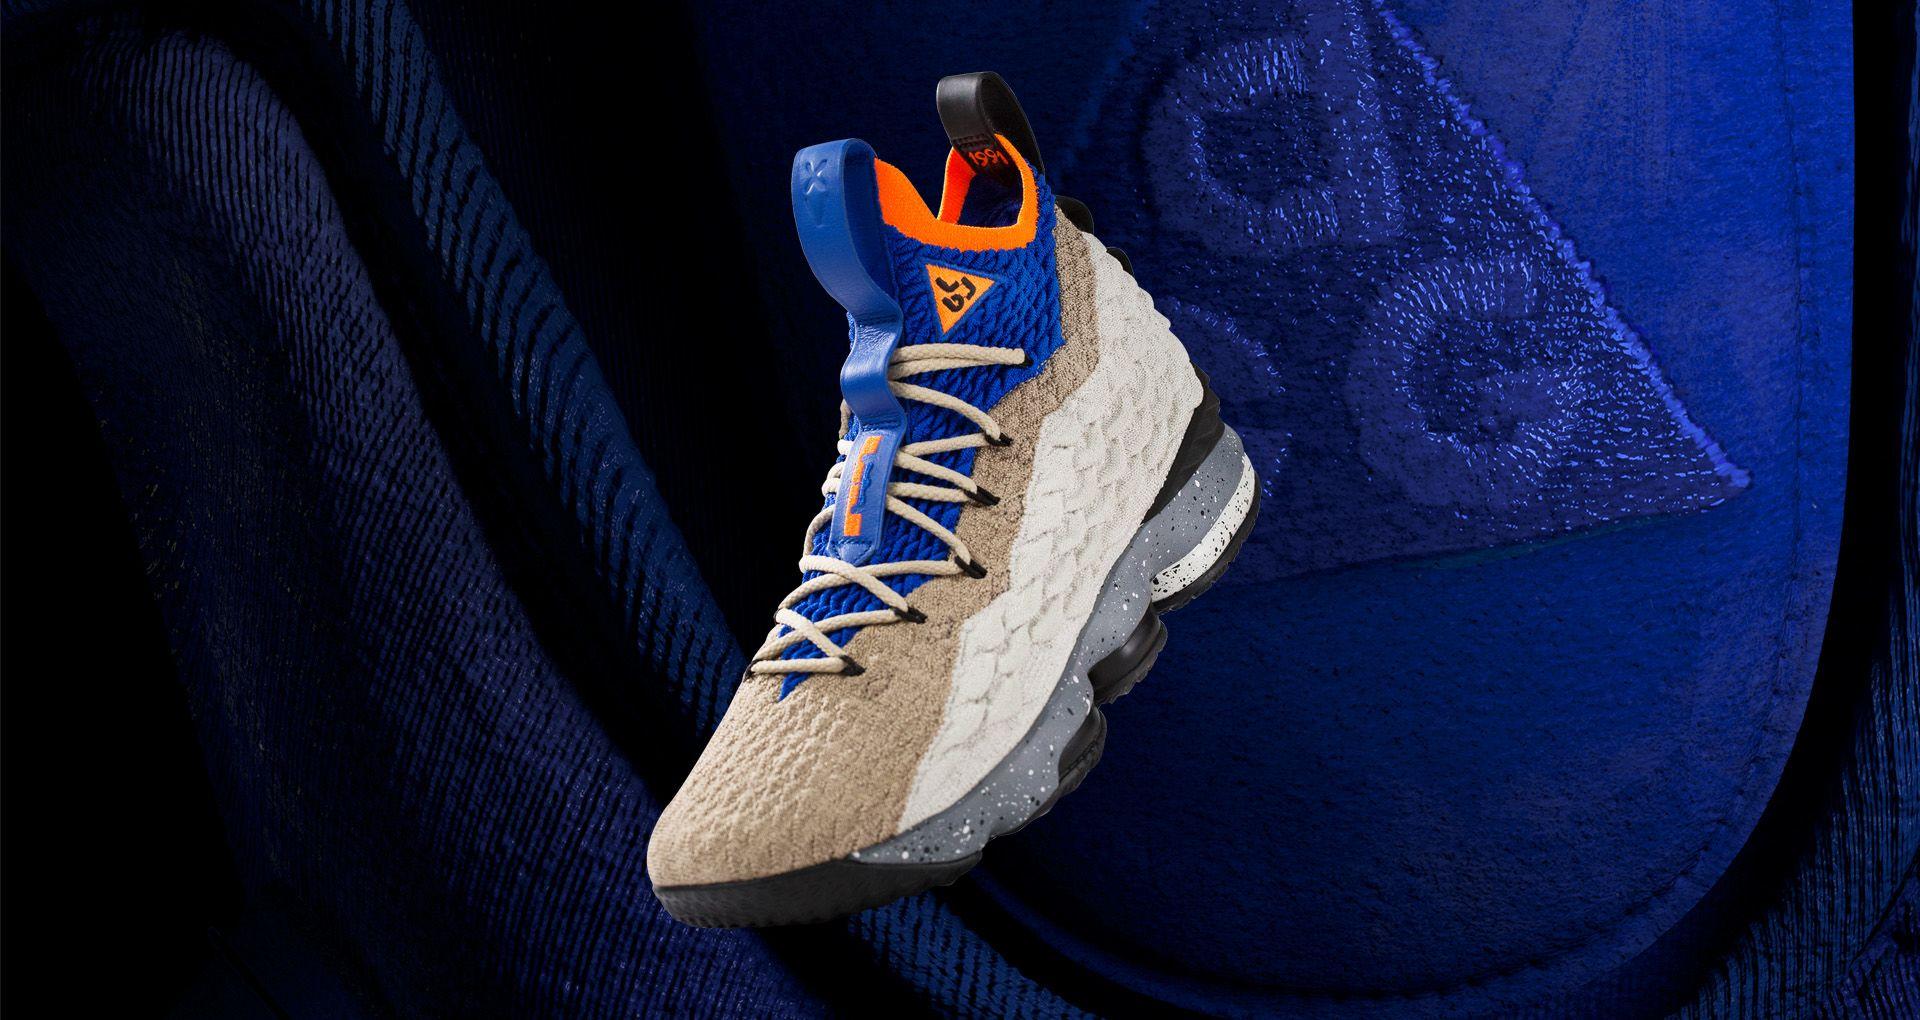 68e4f3435a6 Nike Lebron 15  Mowabb  Release Date. Nike+ SNKRS